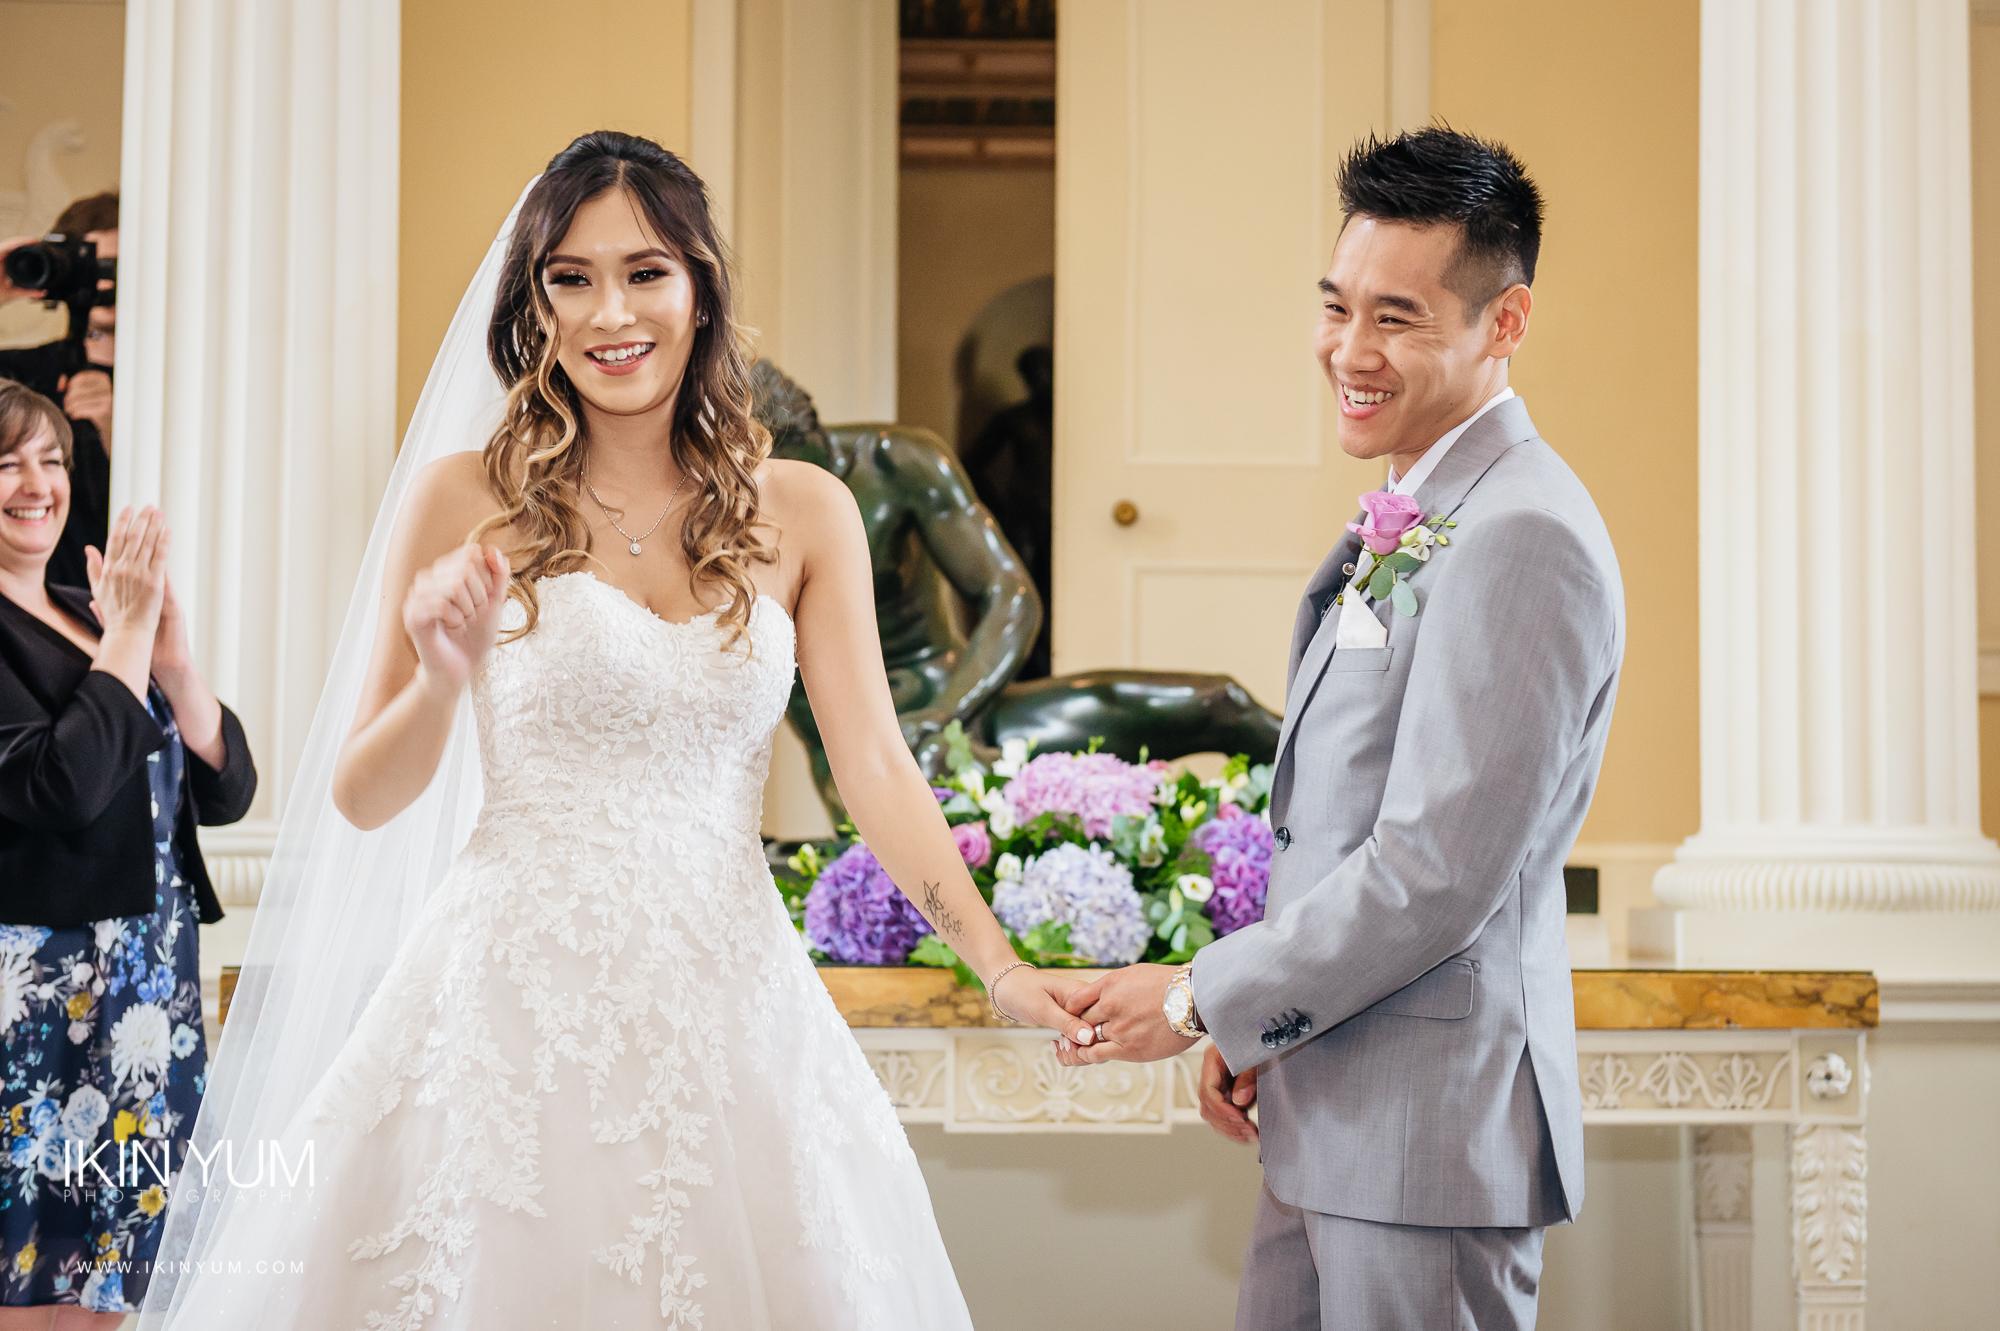 Syon Park Wedding - Ikin Yum Photography -060.jpg